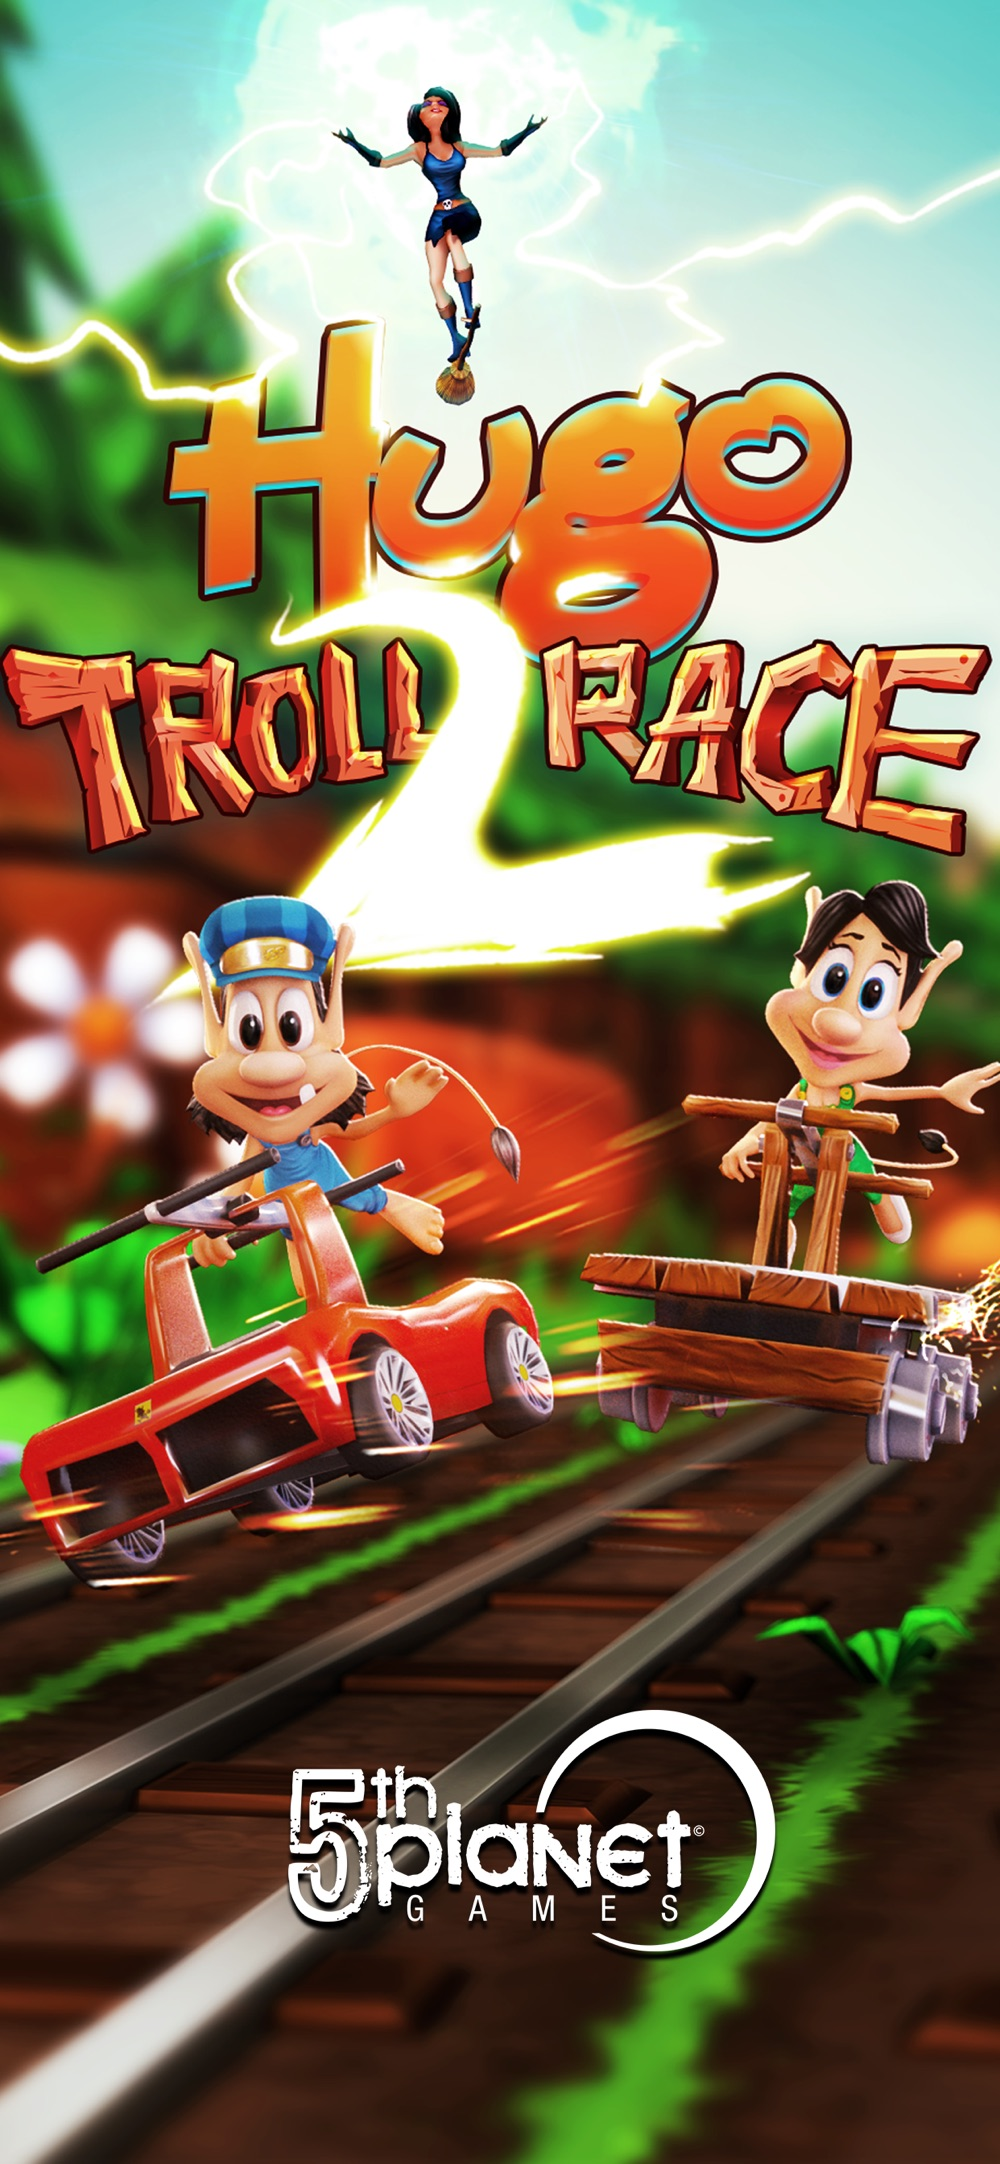 Hugo Troll Race 2: Rail Rush Cheat Codes